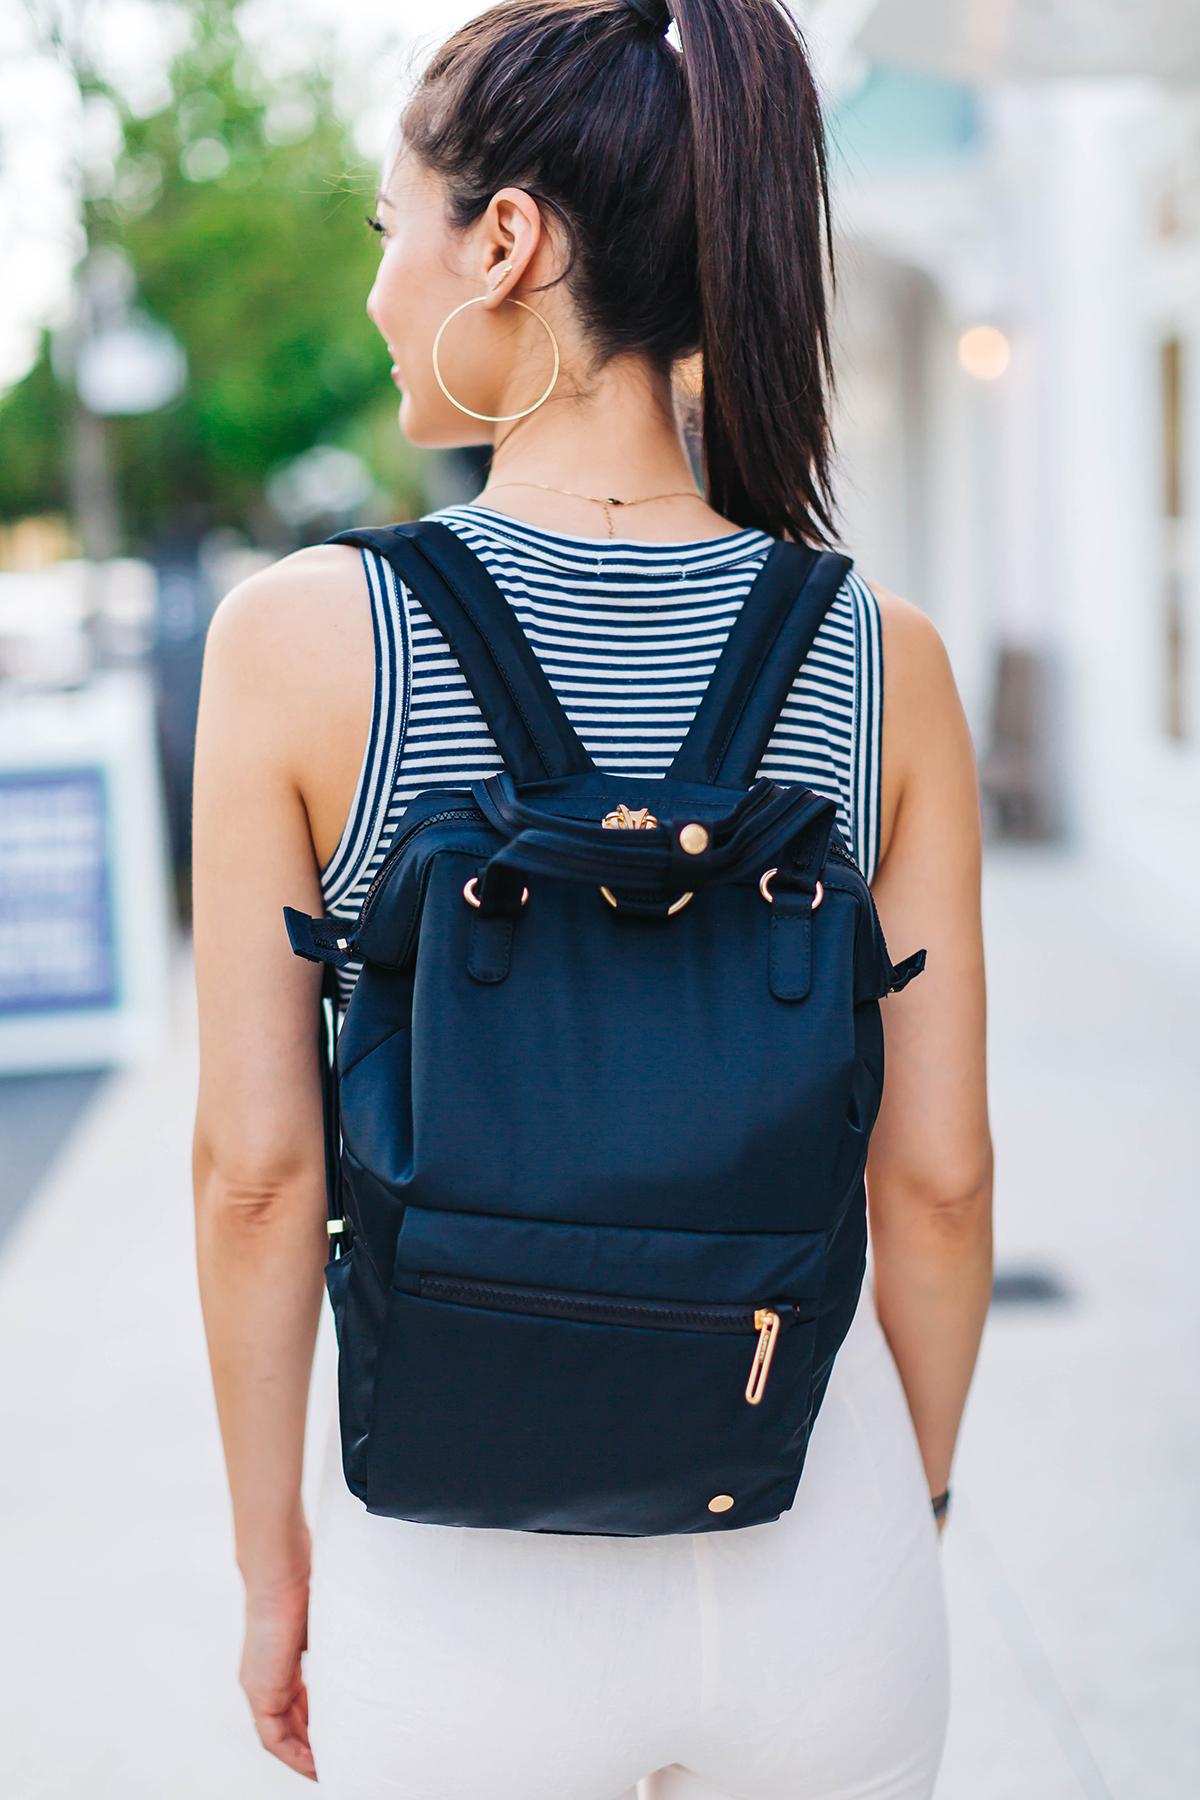 CitySafe CX Backpack Mini